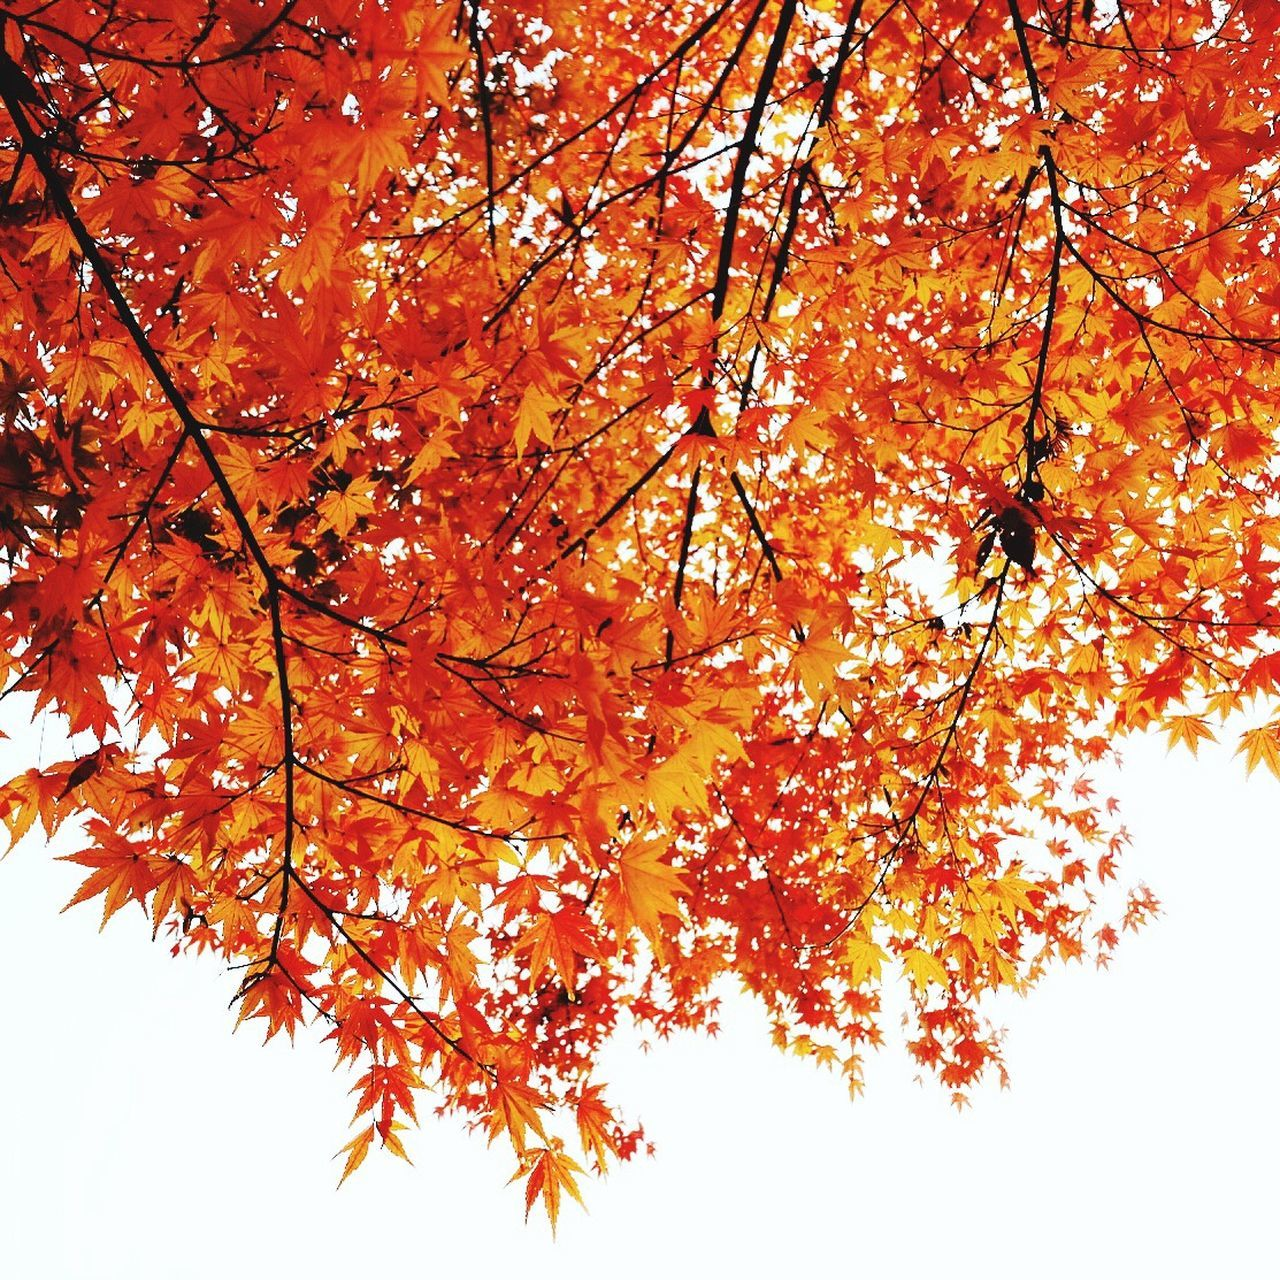 Autumn Nature Orange Color Tree Leaf Beauty In Nature Maple Leaf Maple Nature Fujifilm_xseries Japan Photography Wabi-sabi Beautiful Nature X-PRO2 Beauty In Nature Eyemphotography Fujifilm EyeEm Best Shots EyeEm Best Edits EyeEm Gallery Japan